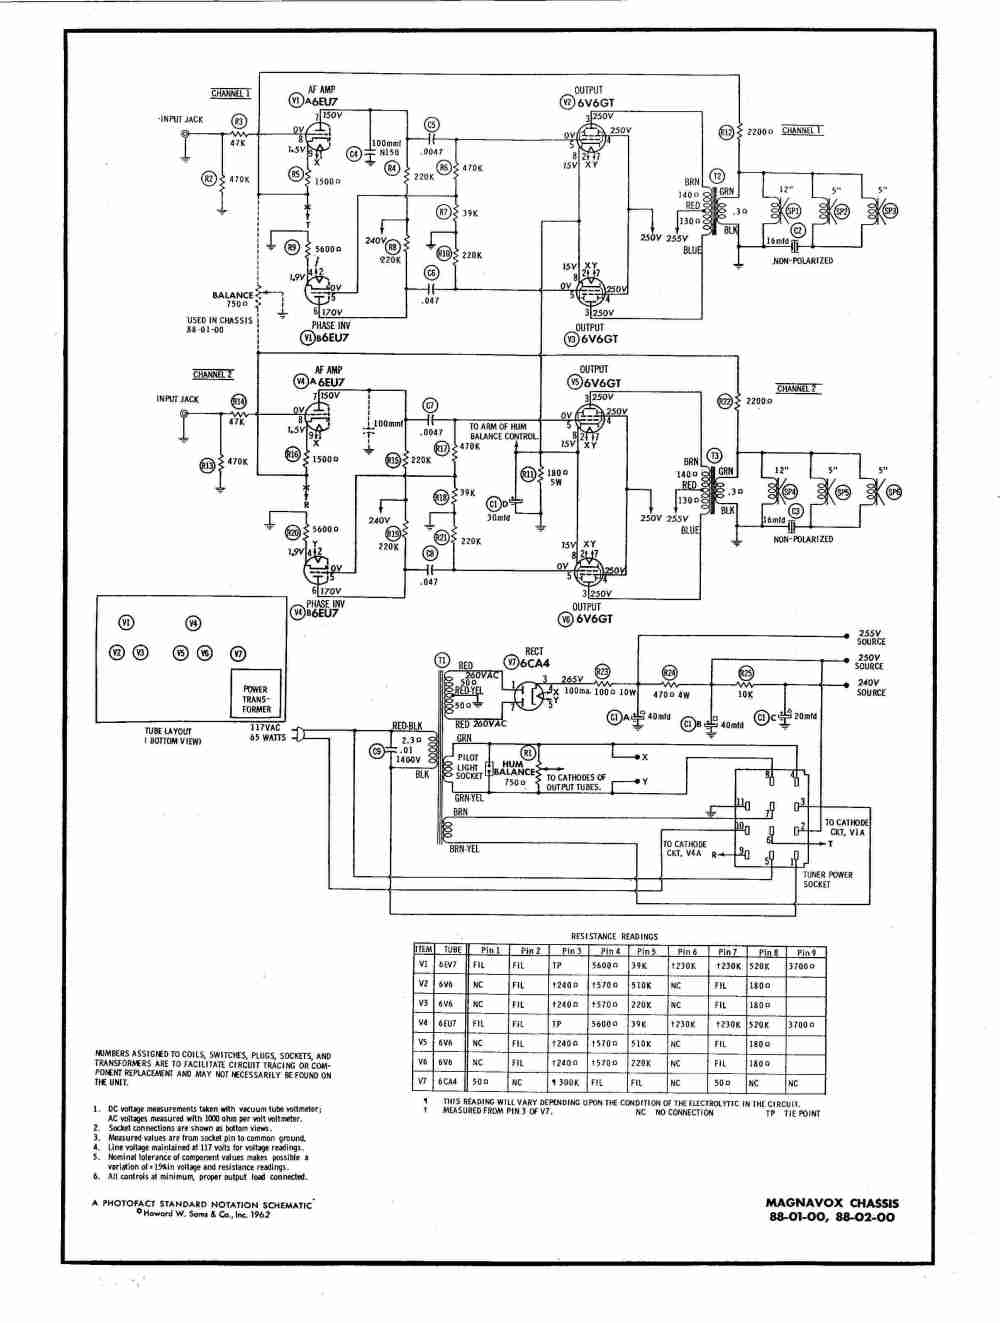 medium resolution of magnavox 9302 speaker wiring diagram 36 wiring diagram images wiring diagrams mifinder co standard telecaster wiring